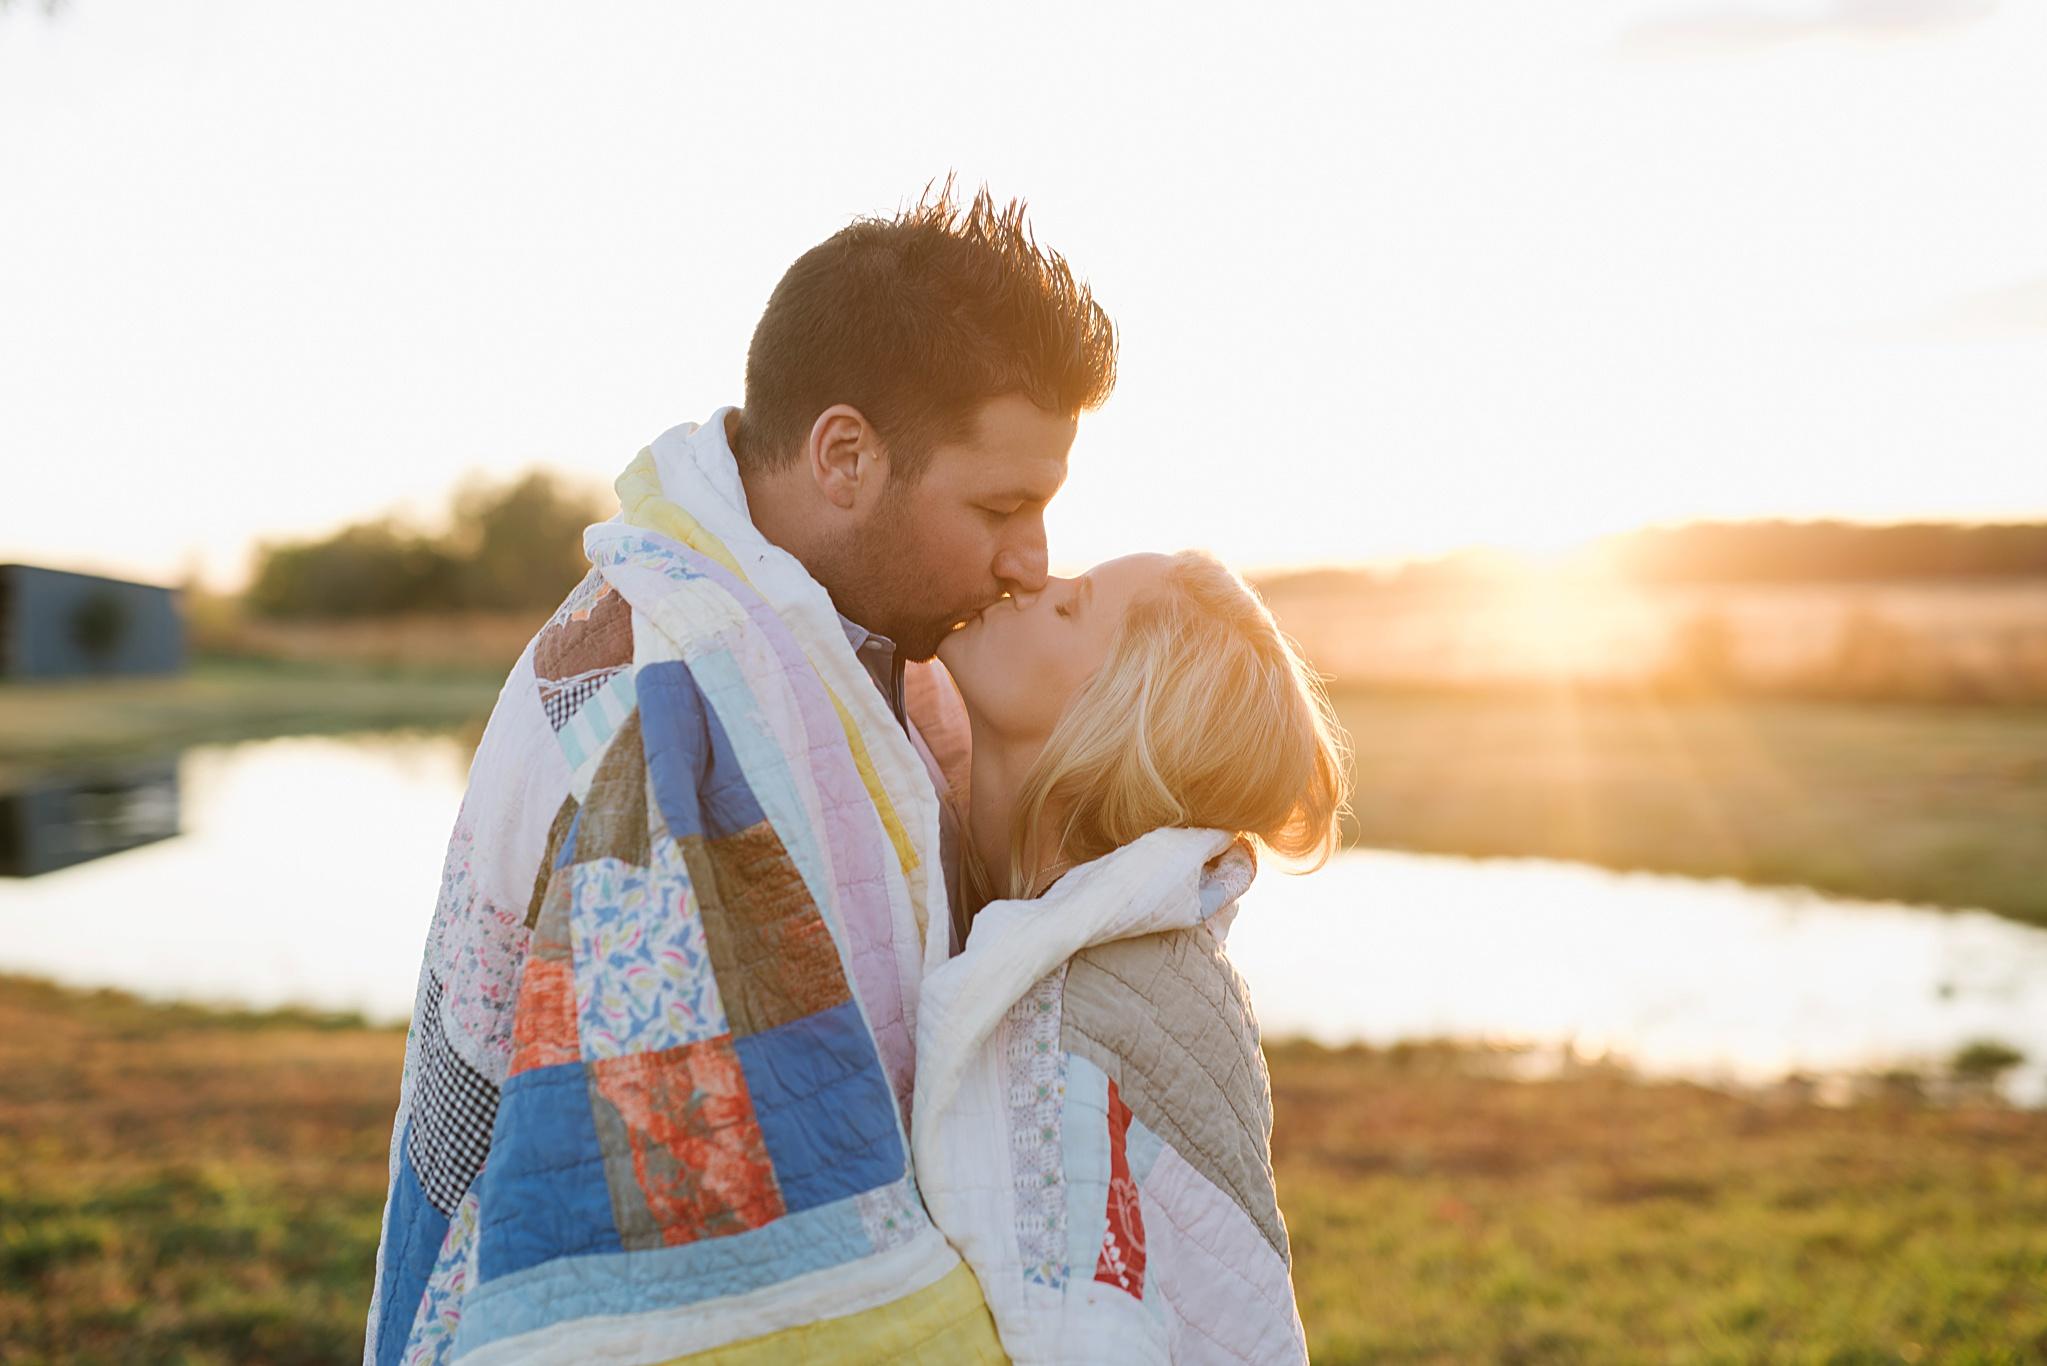 oklahoma-city-tulsa-photographer-wedding-engagement